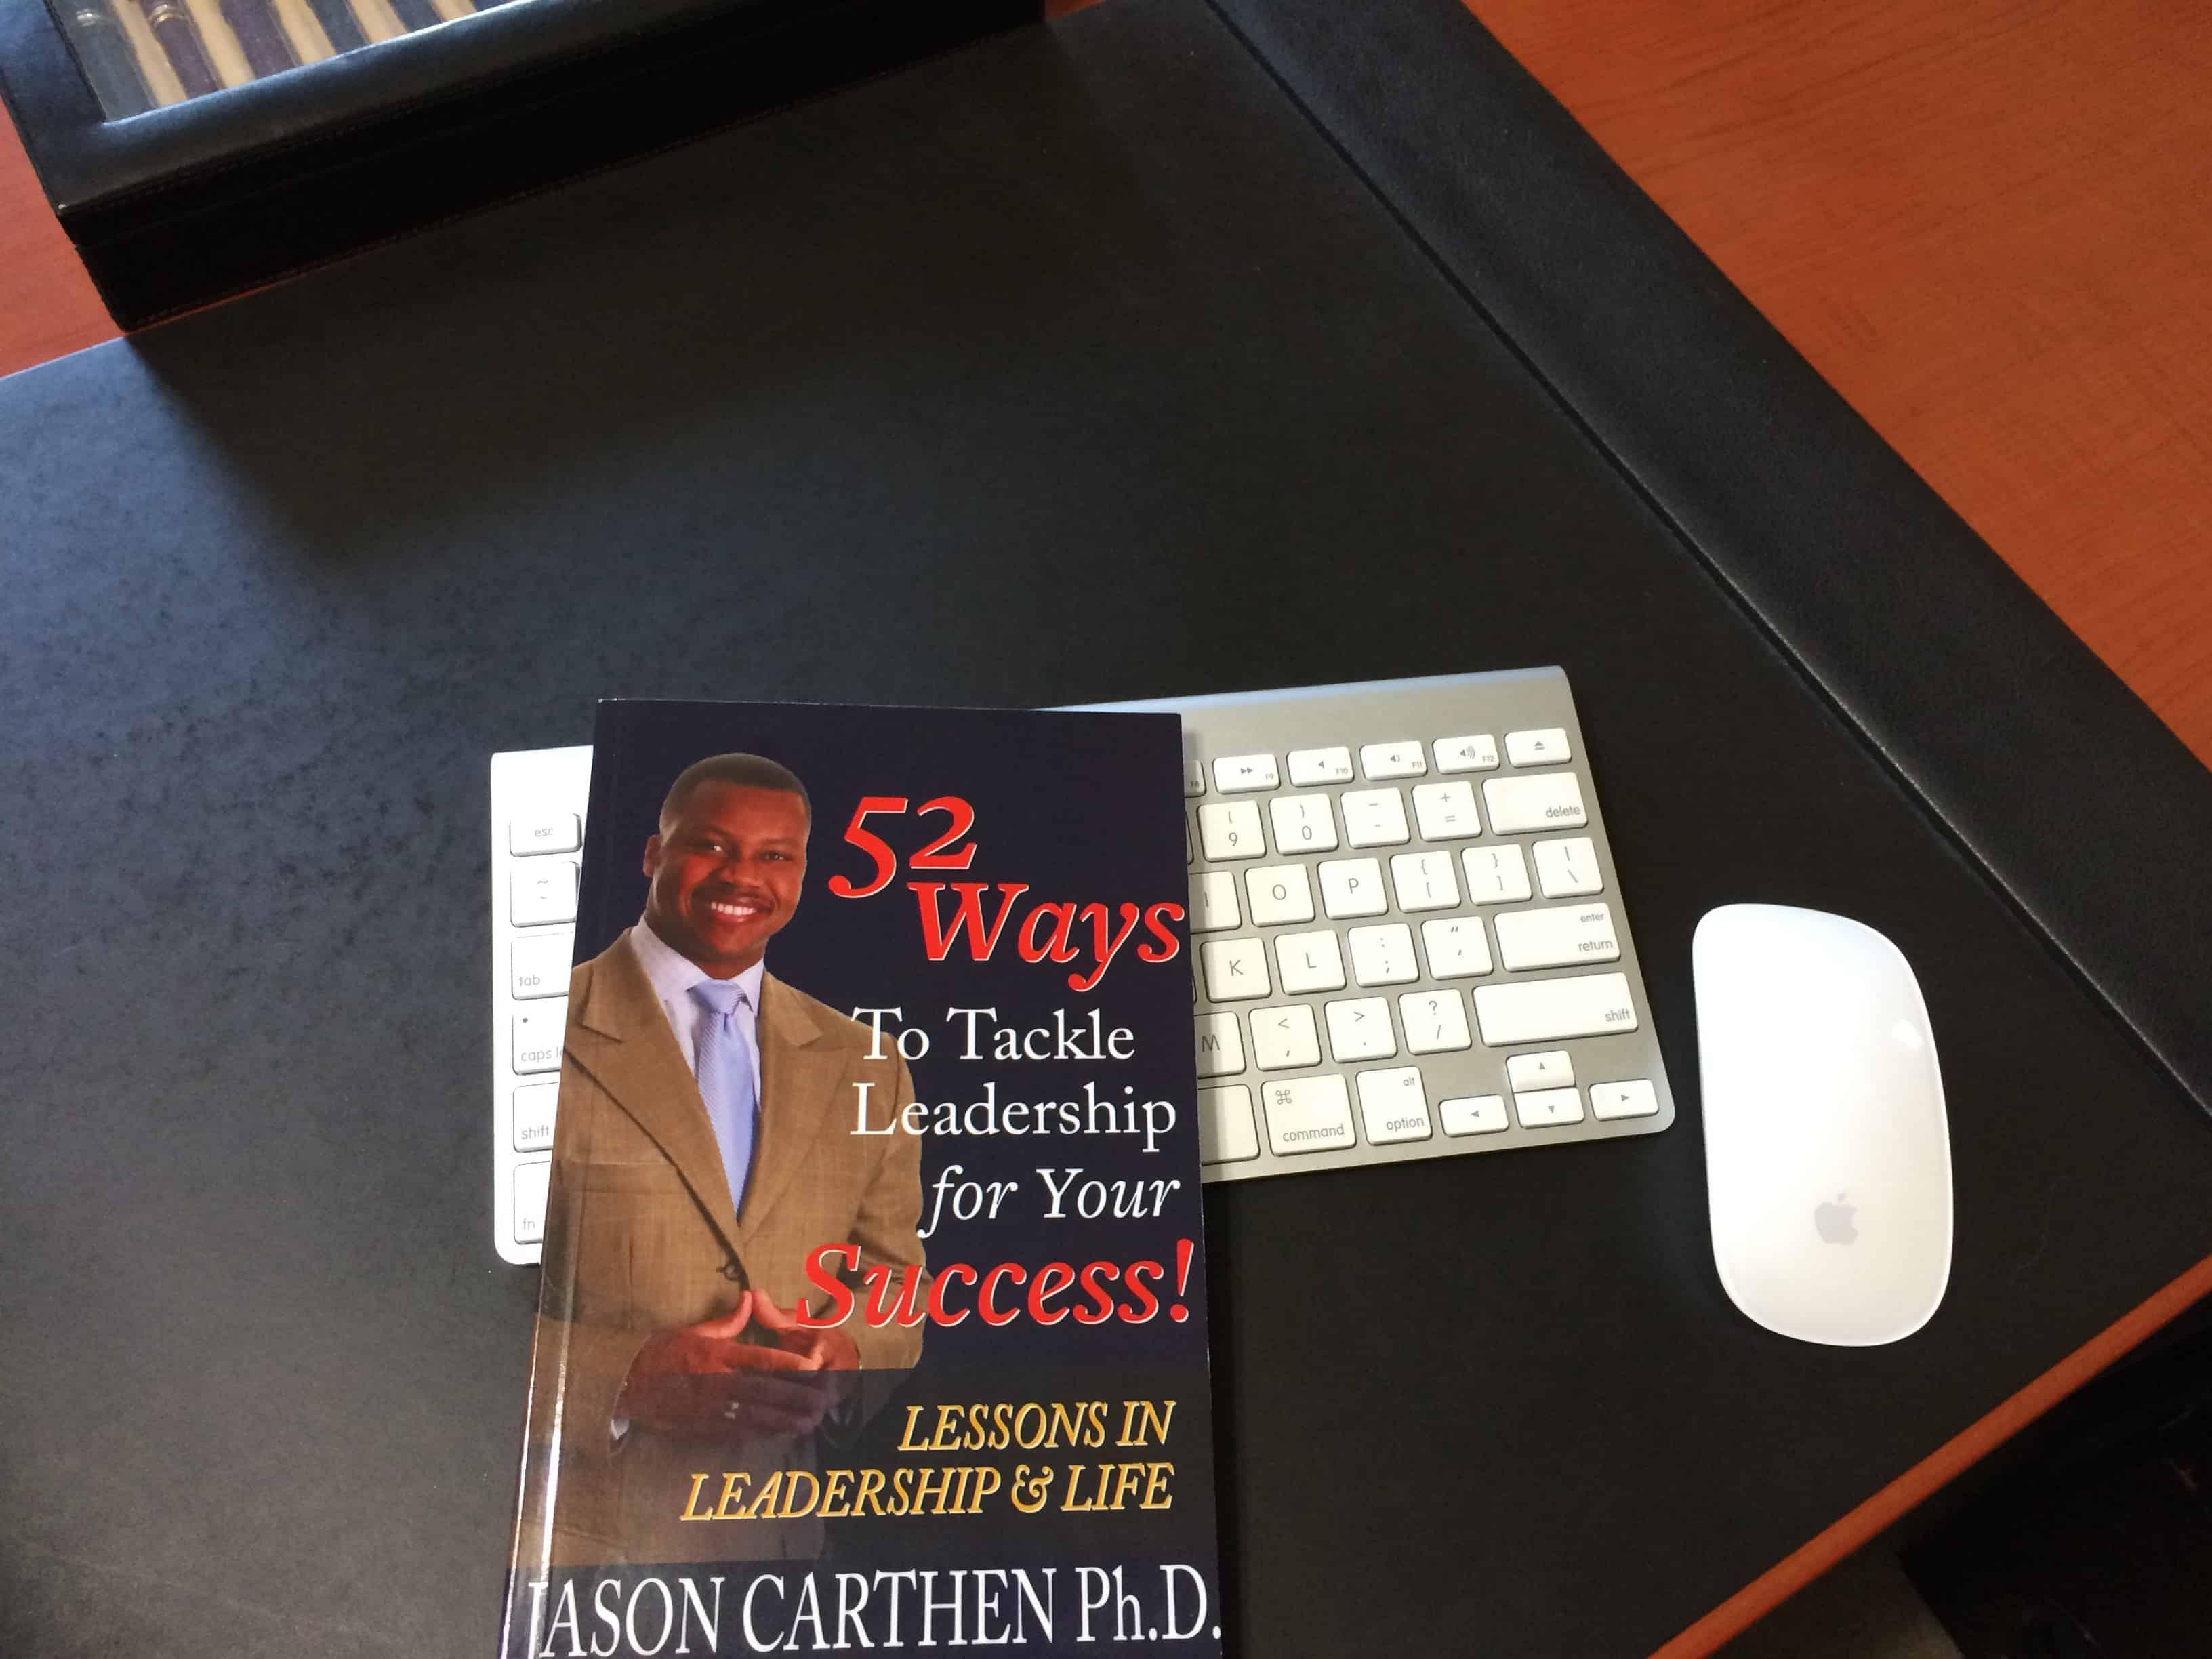 Dr. Jason Carthen: 52 Ways Desk image